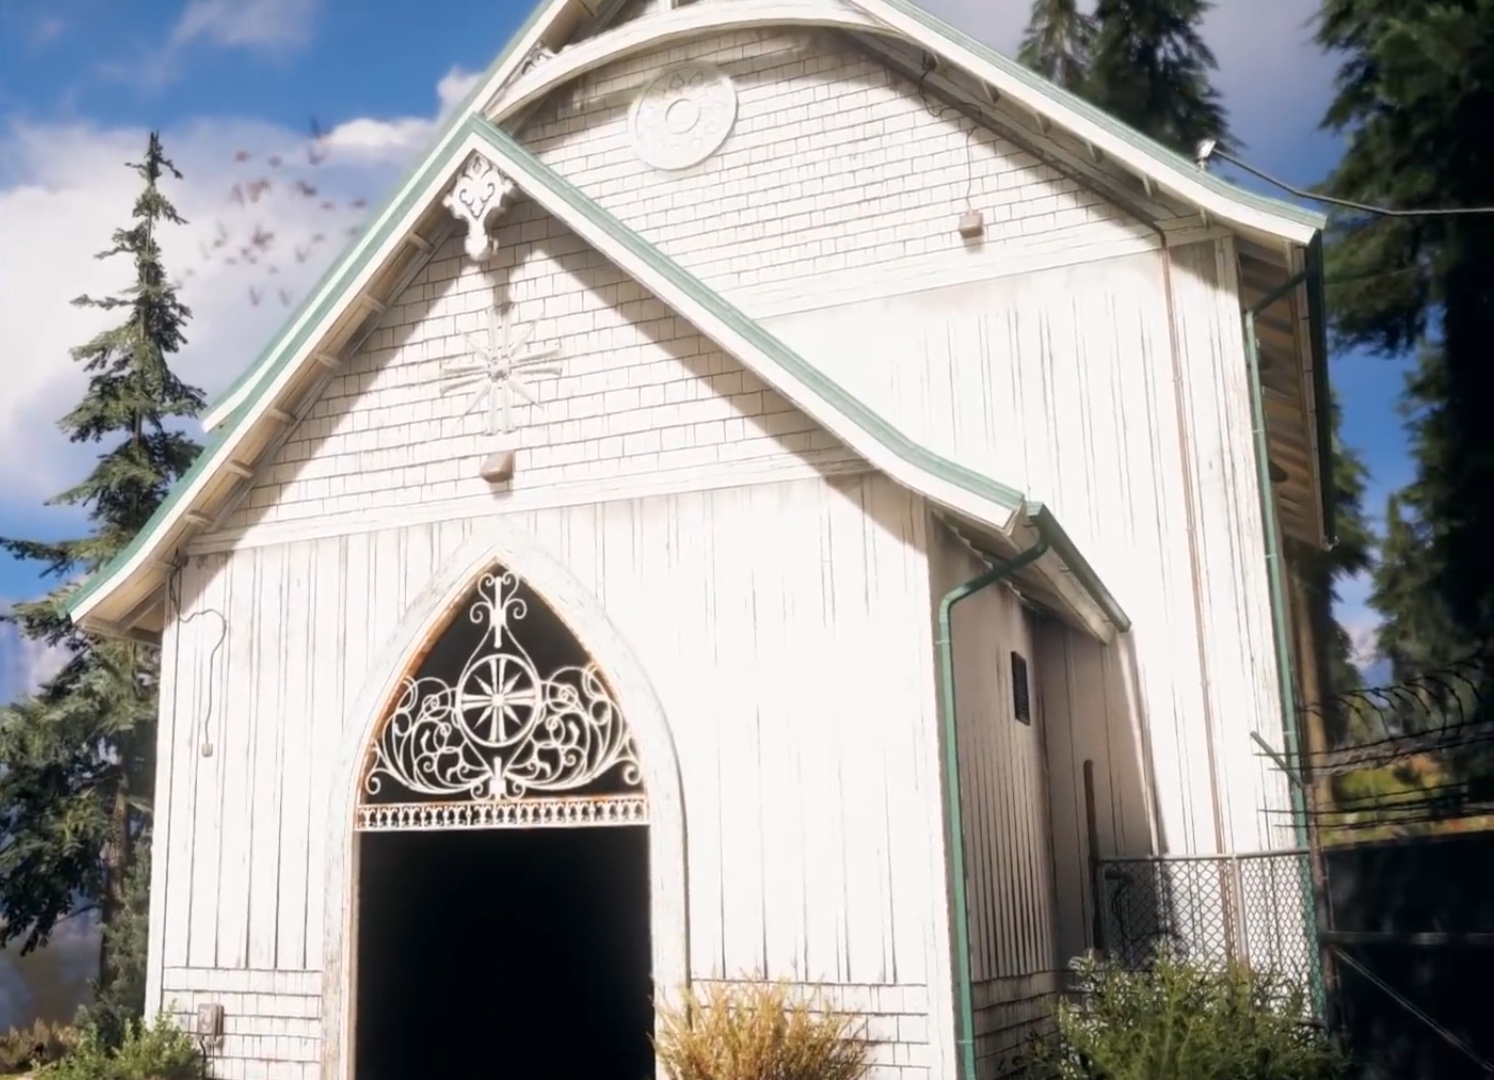 Church of Eden's Gate